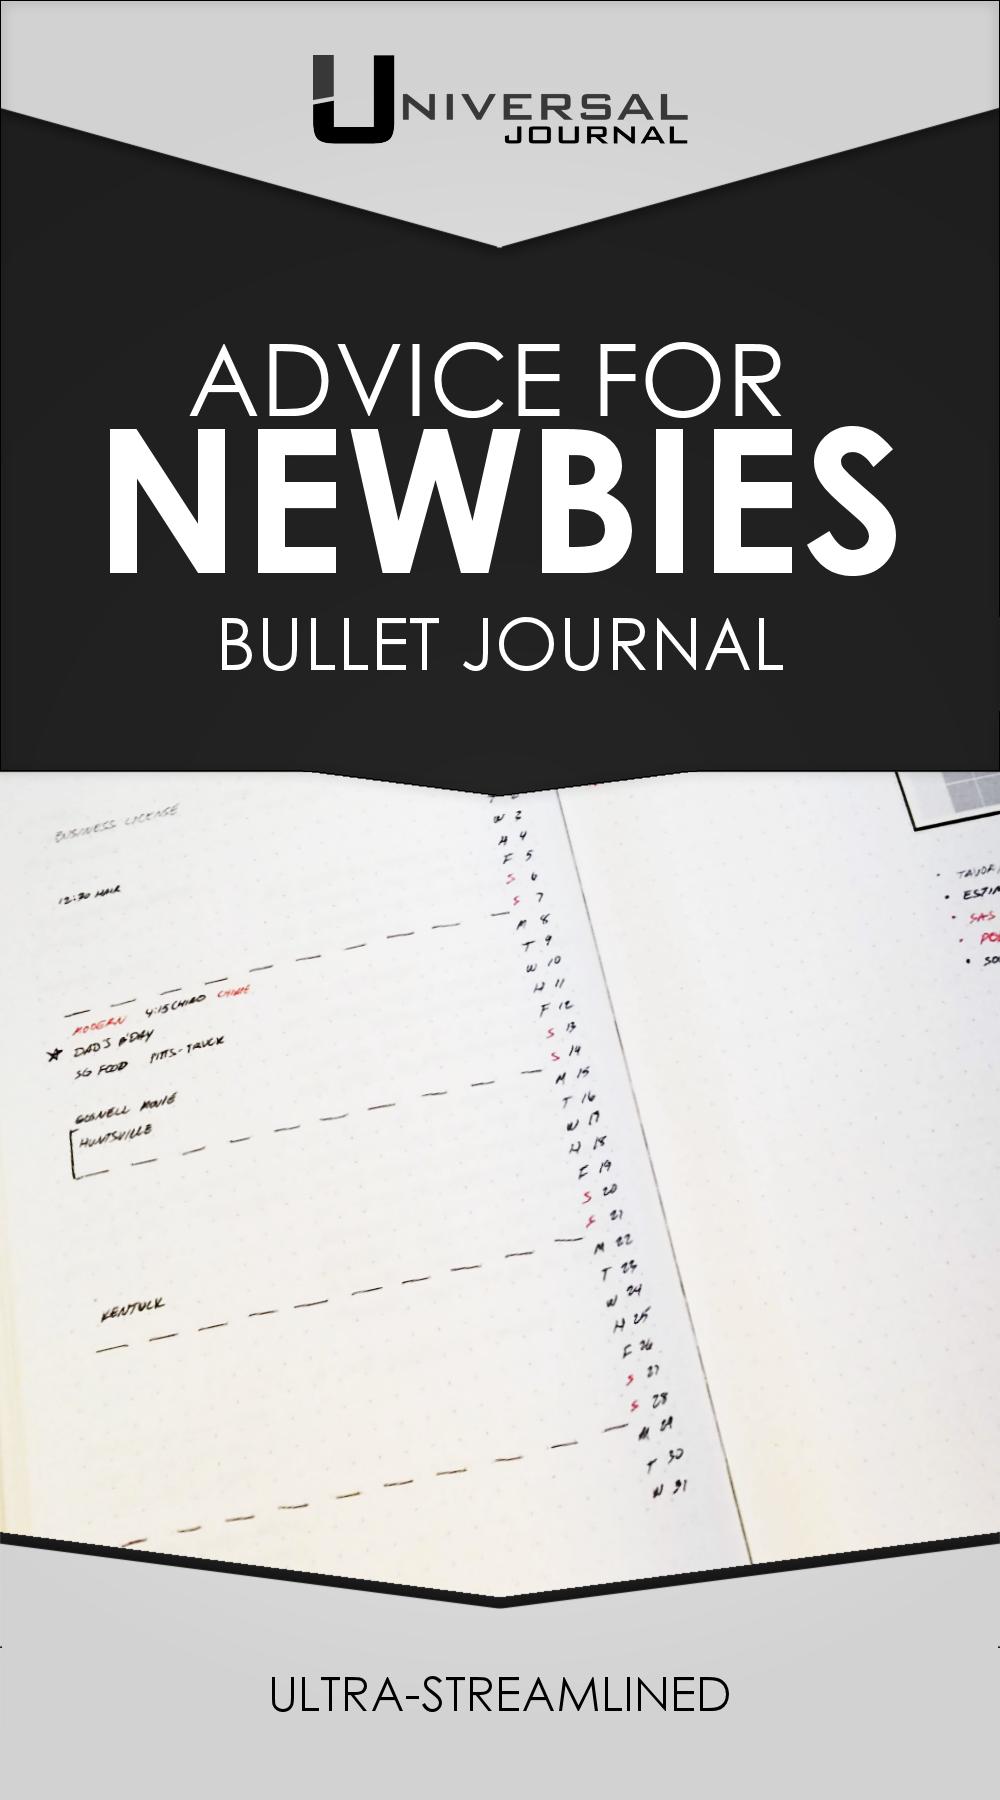 Universal Journal: Bullet Journal Advice for Newbies